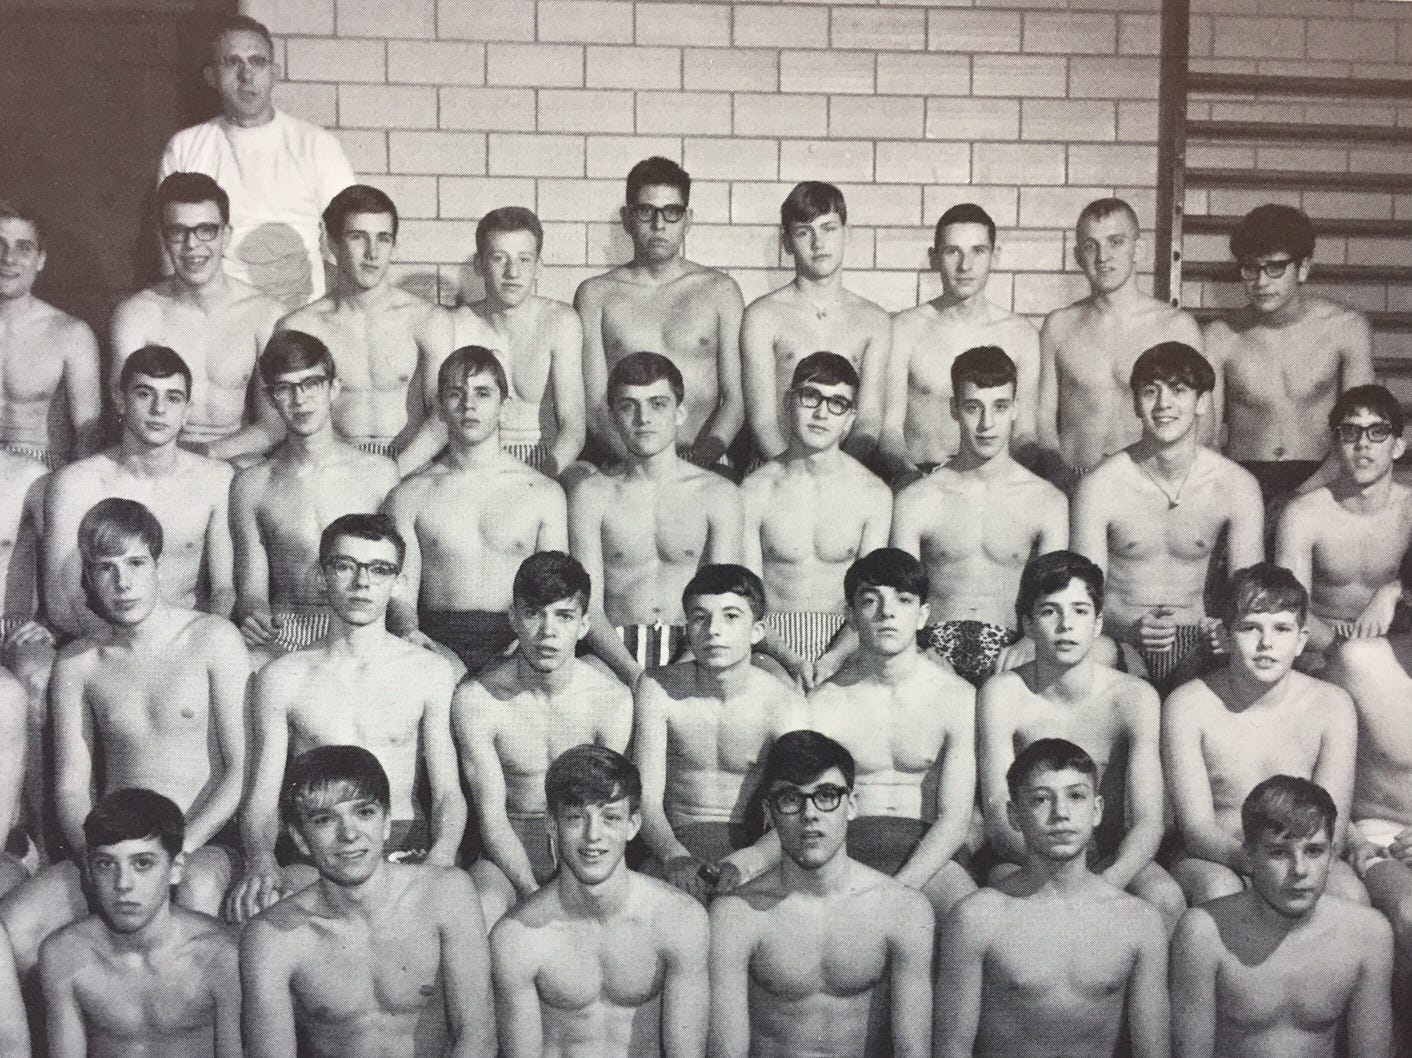 Female nude swim teams